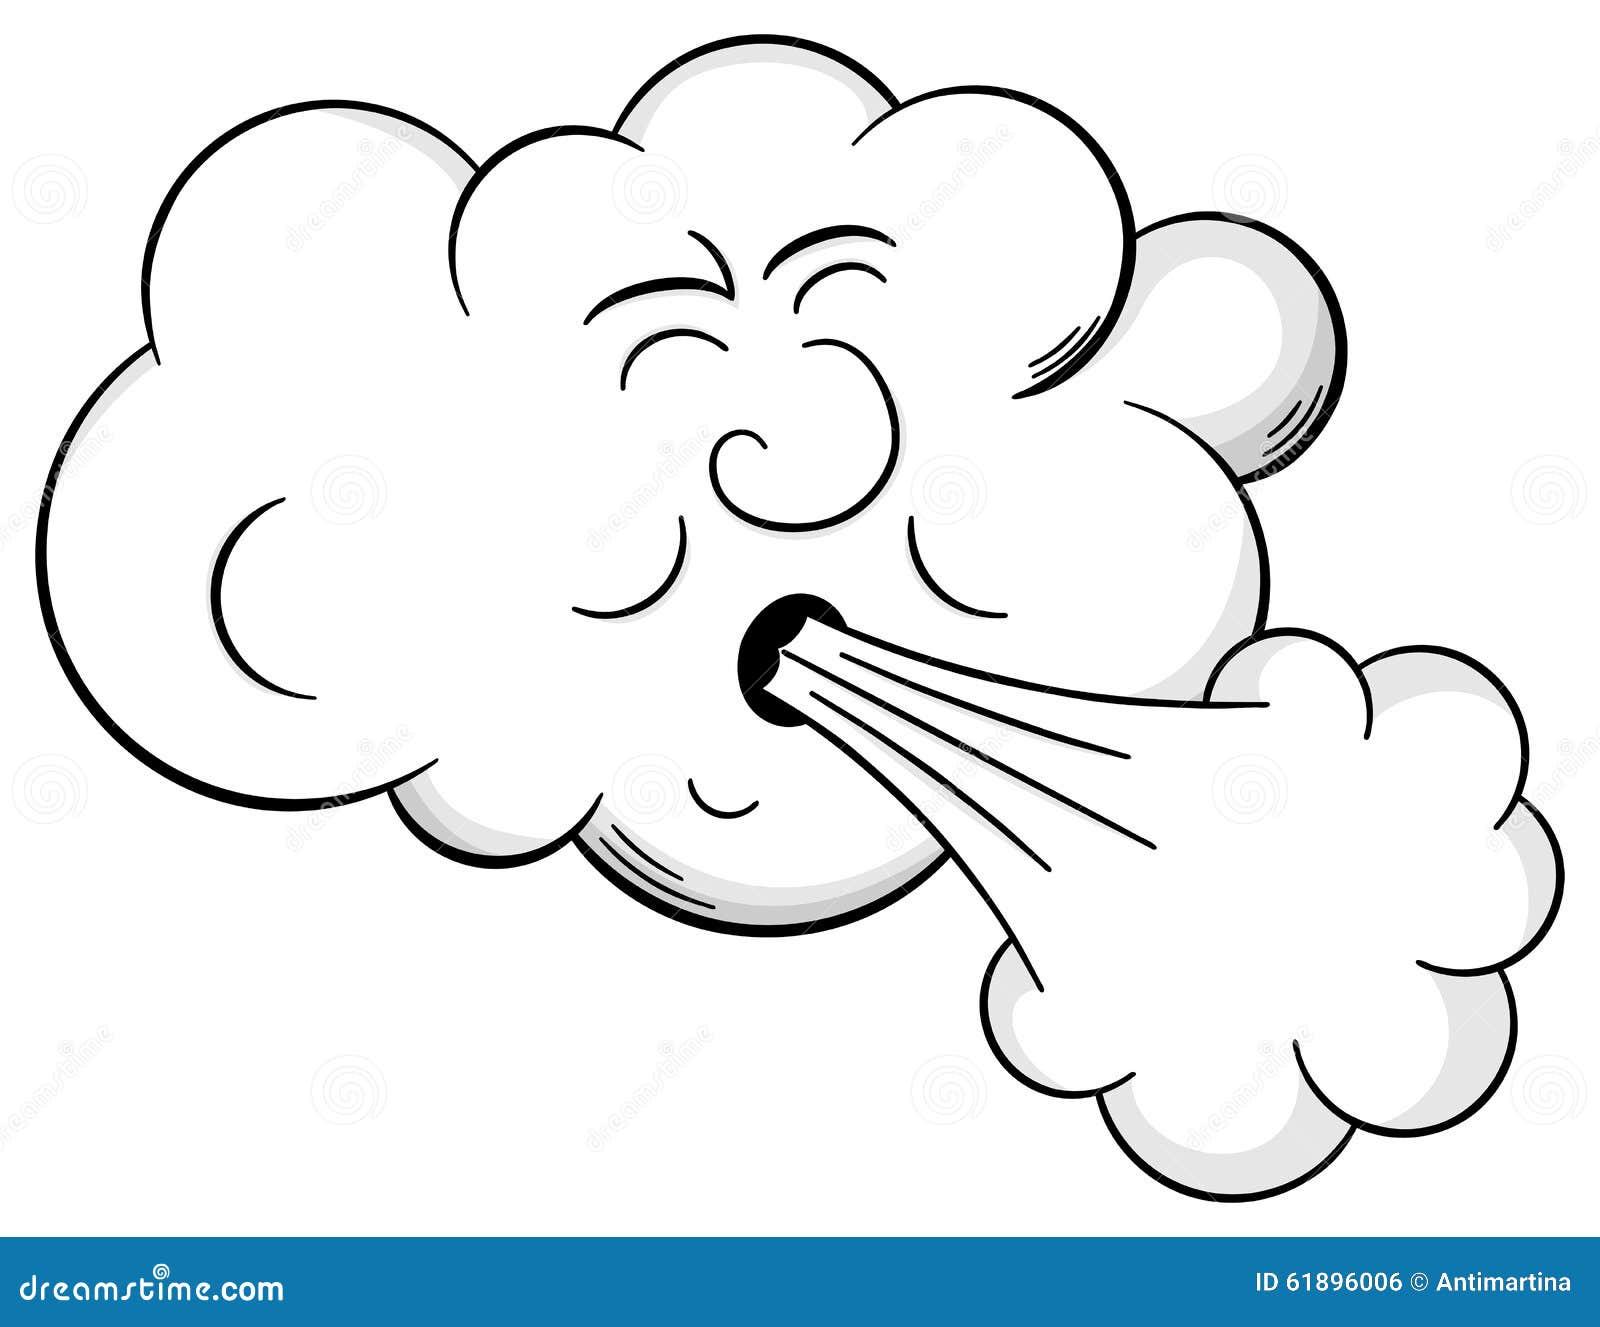 Blowing air